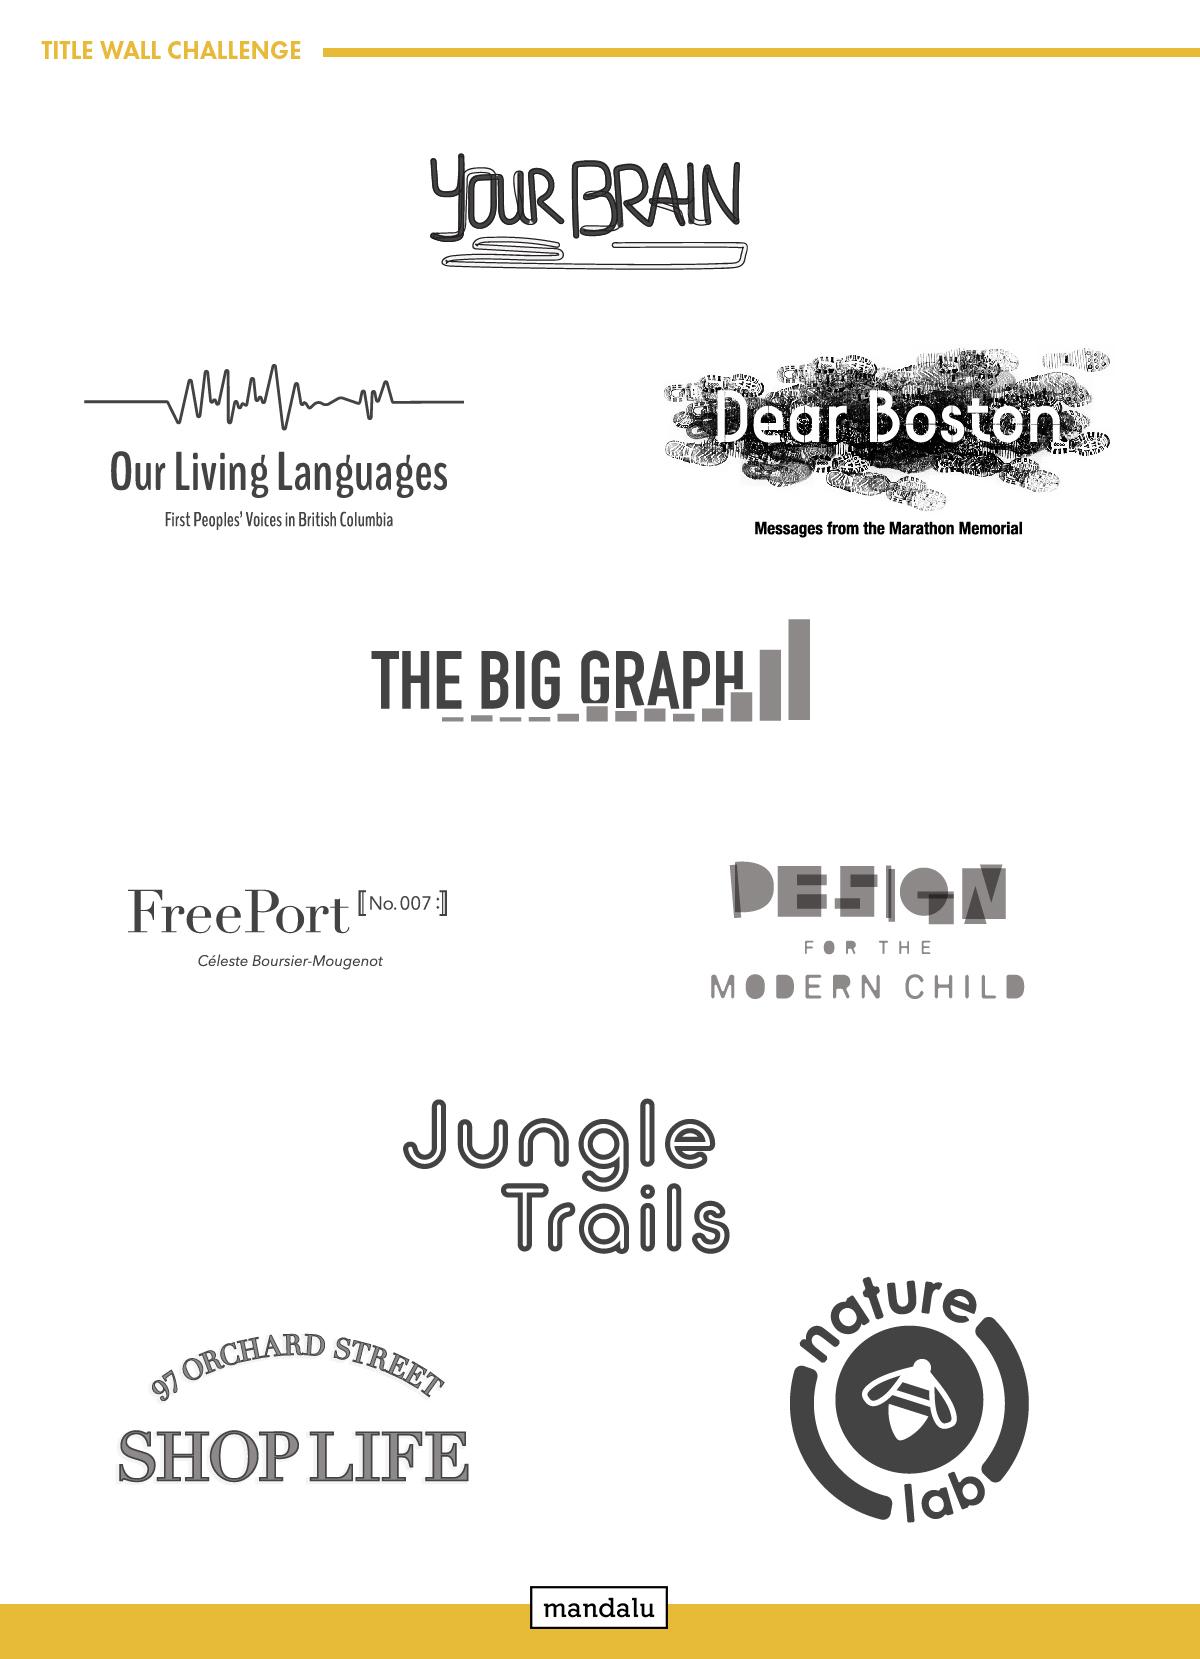 Graphic-Design-Exhibition-Logos-19-27.jpg